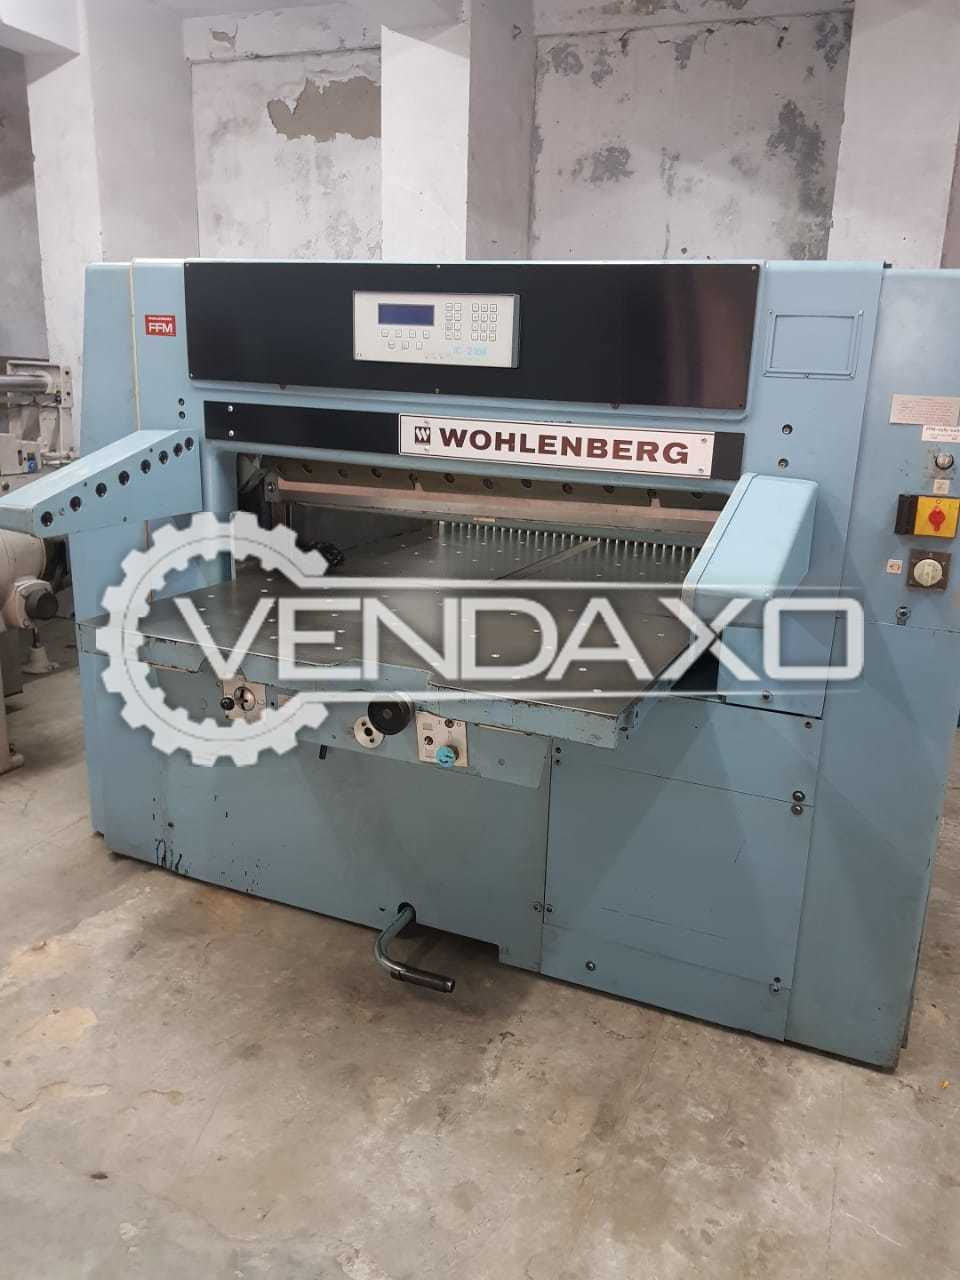 Wohlenberg 115 Paper Cutting Machine - Size - 45 Inch, 1980 Model